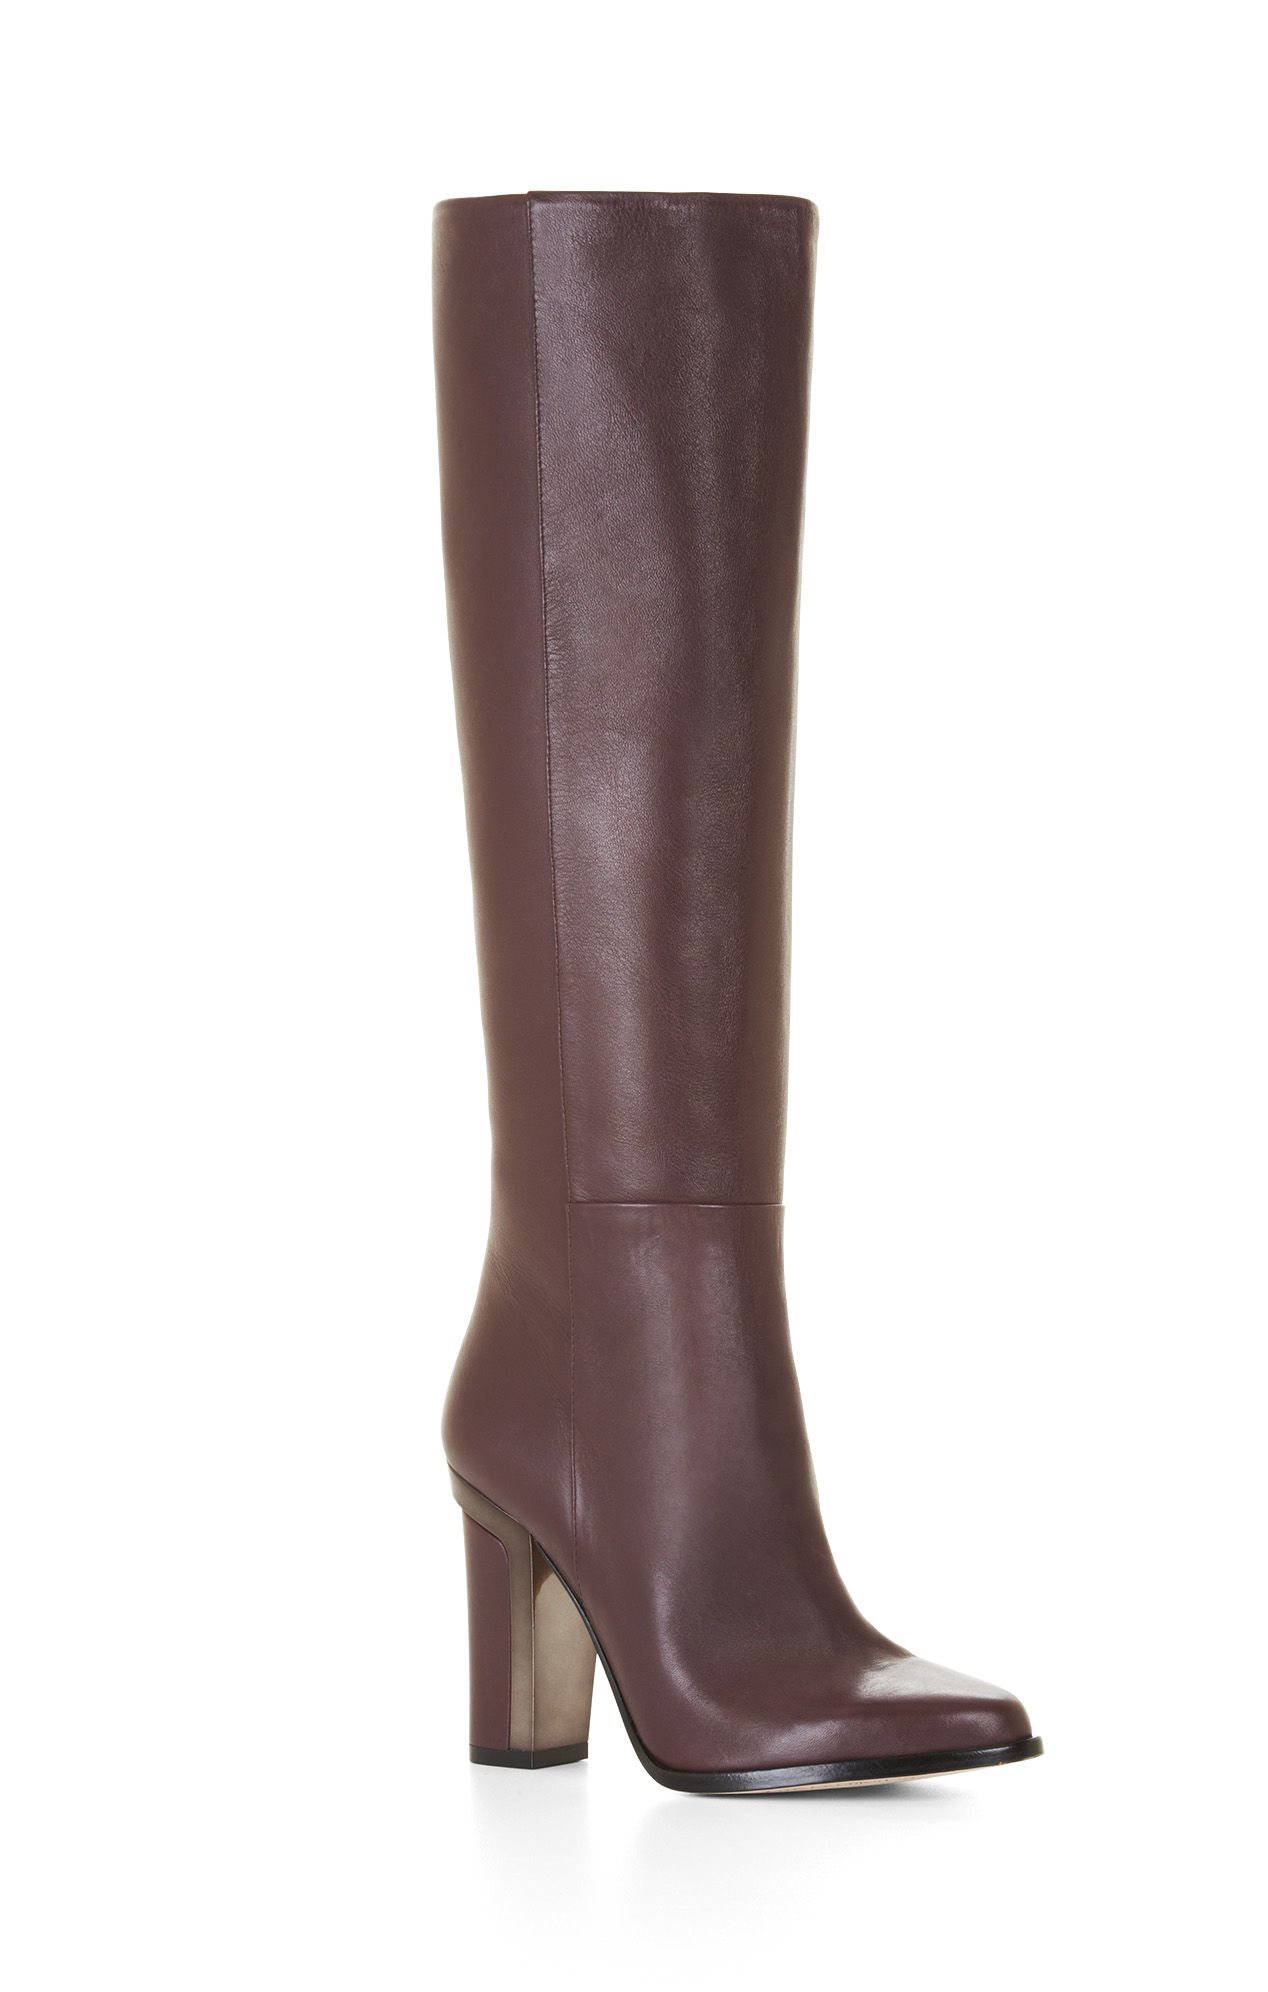 8c2ca8a78fc6 BCBGMAXAZRIA Oak High-heel Leather Knee Boots in Purple - Lyst